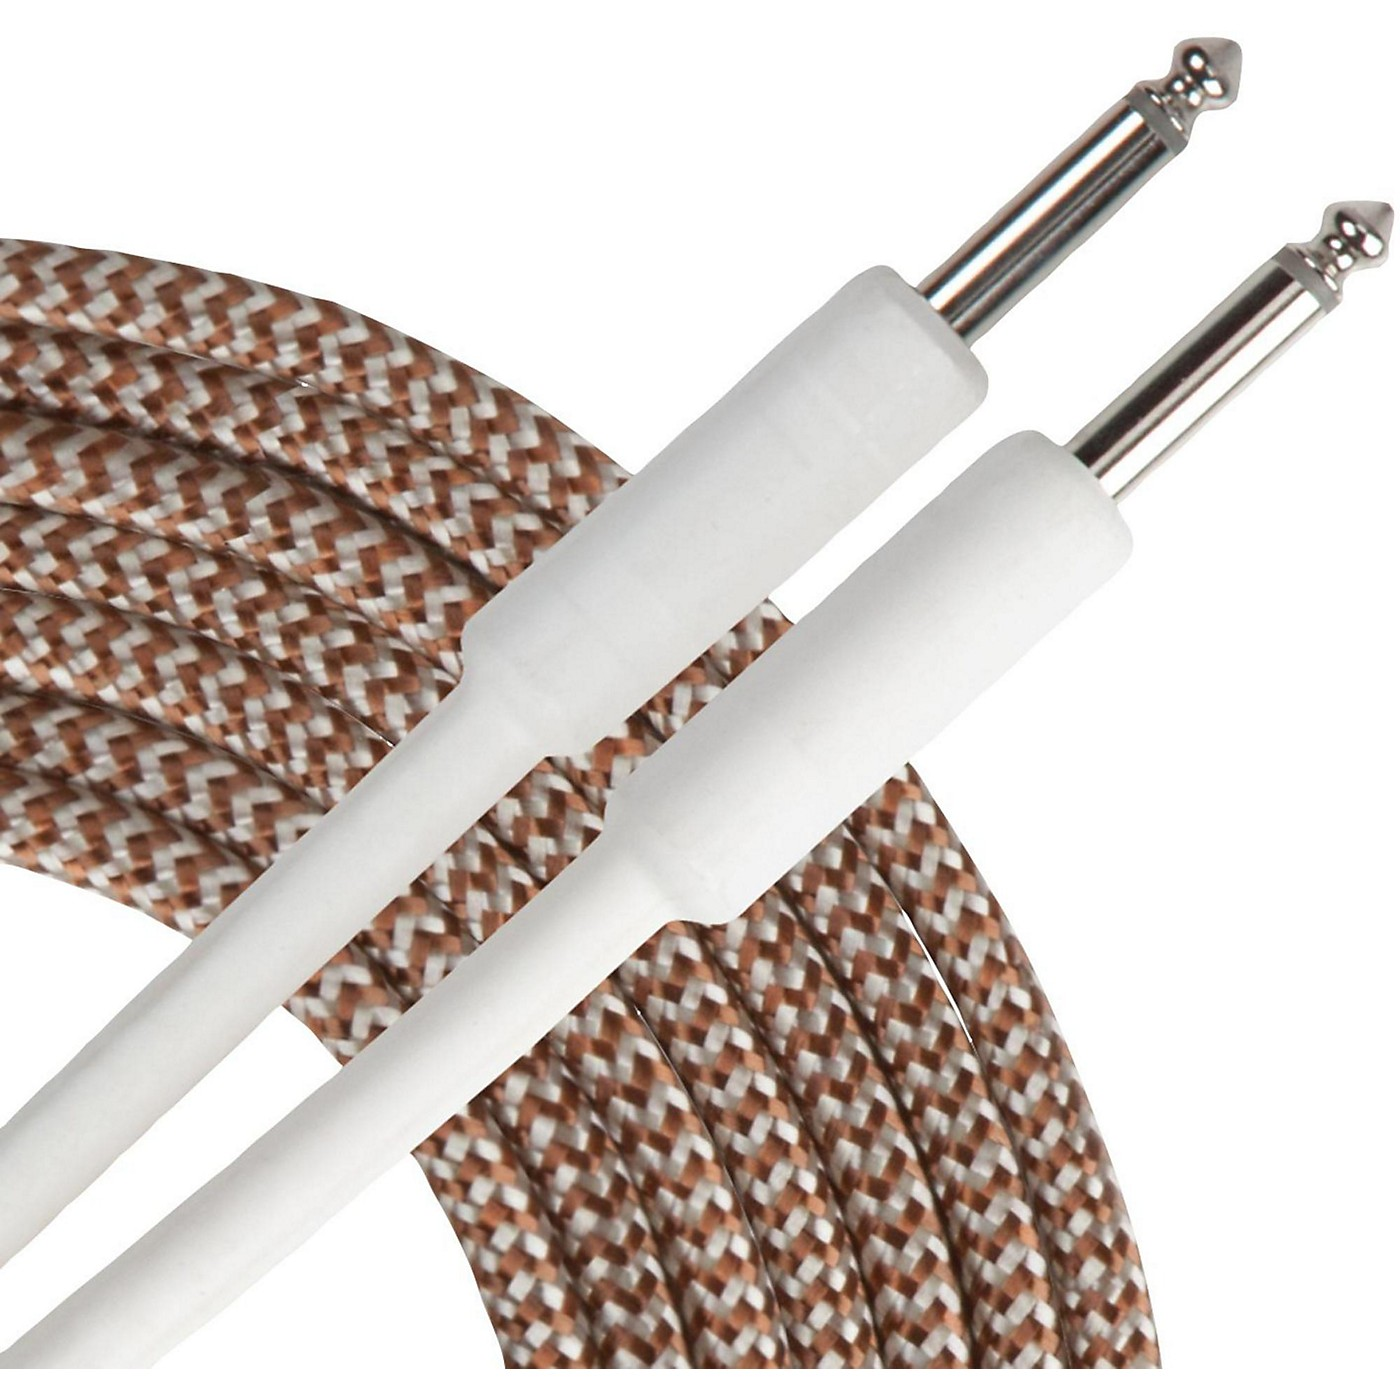 Livewire Advantage Tweed Instrument Cable thumbnail